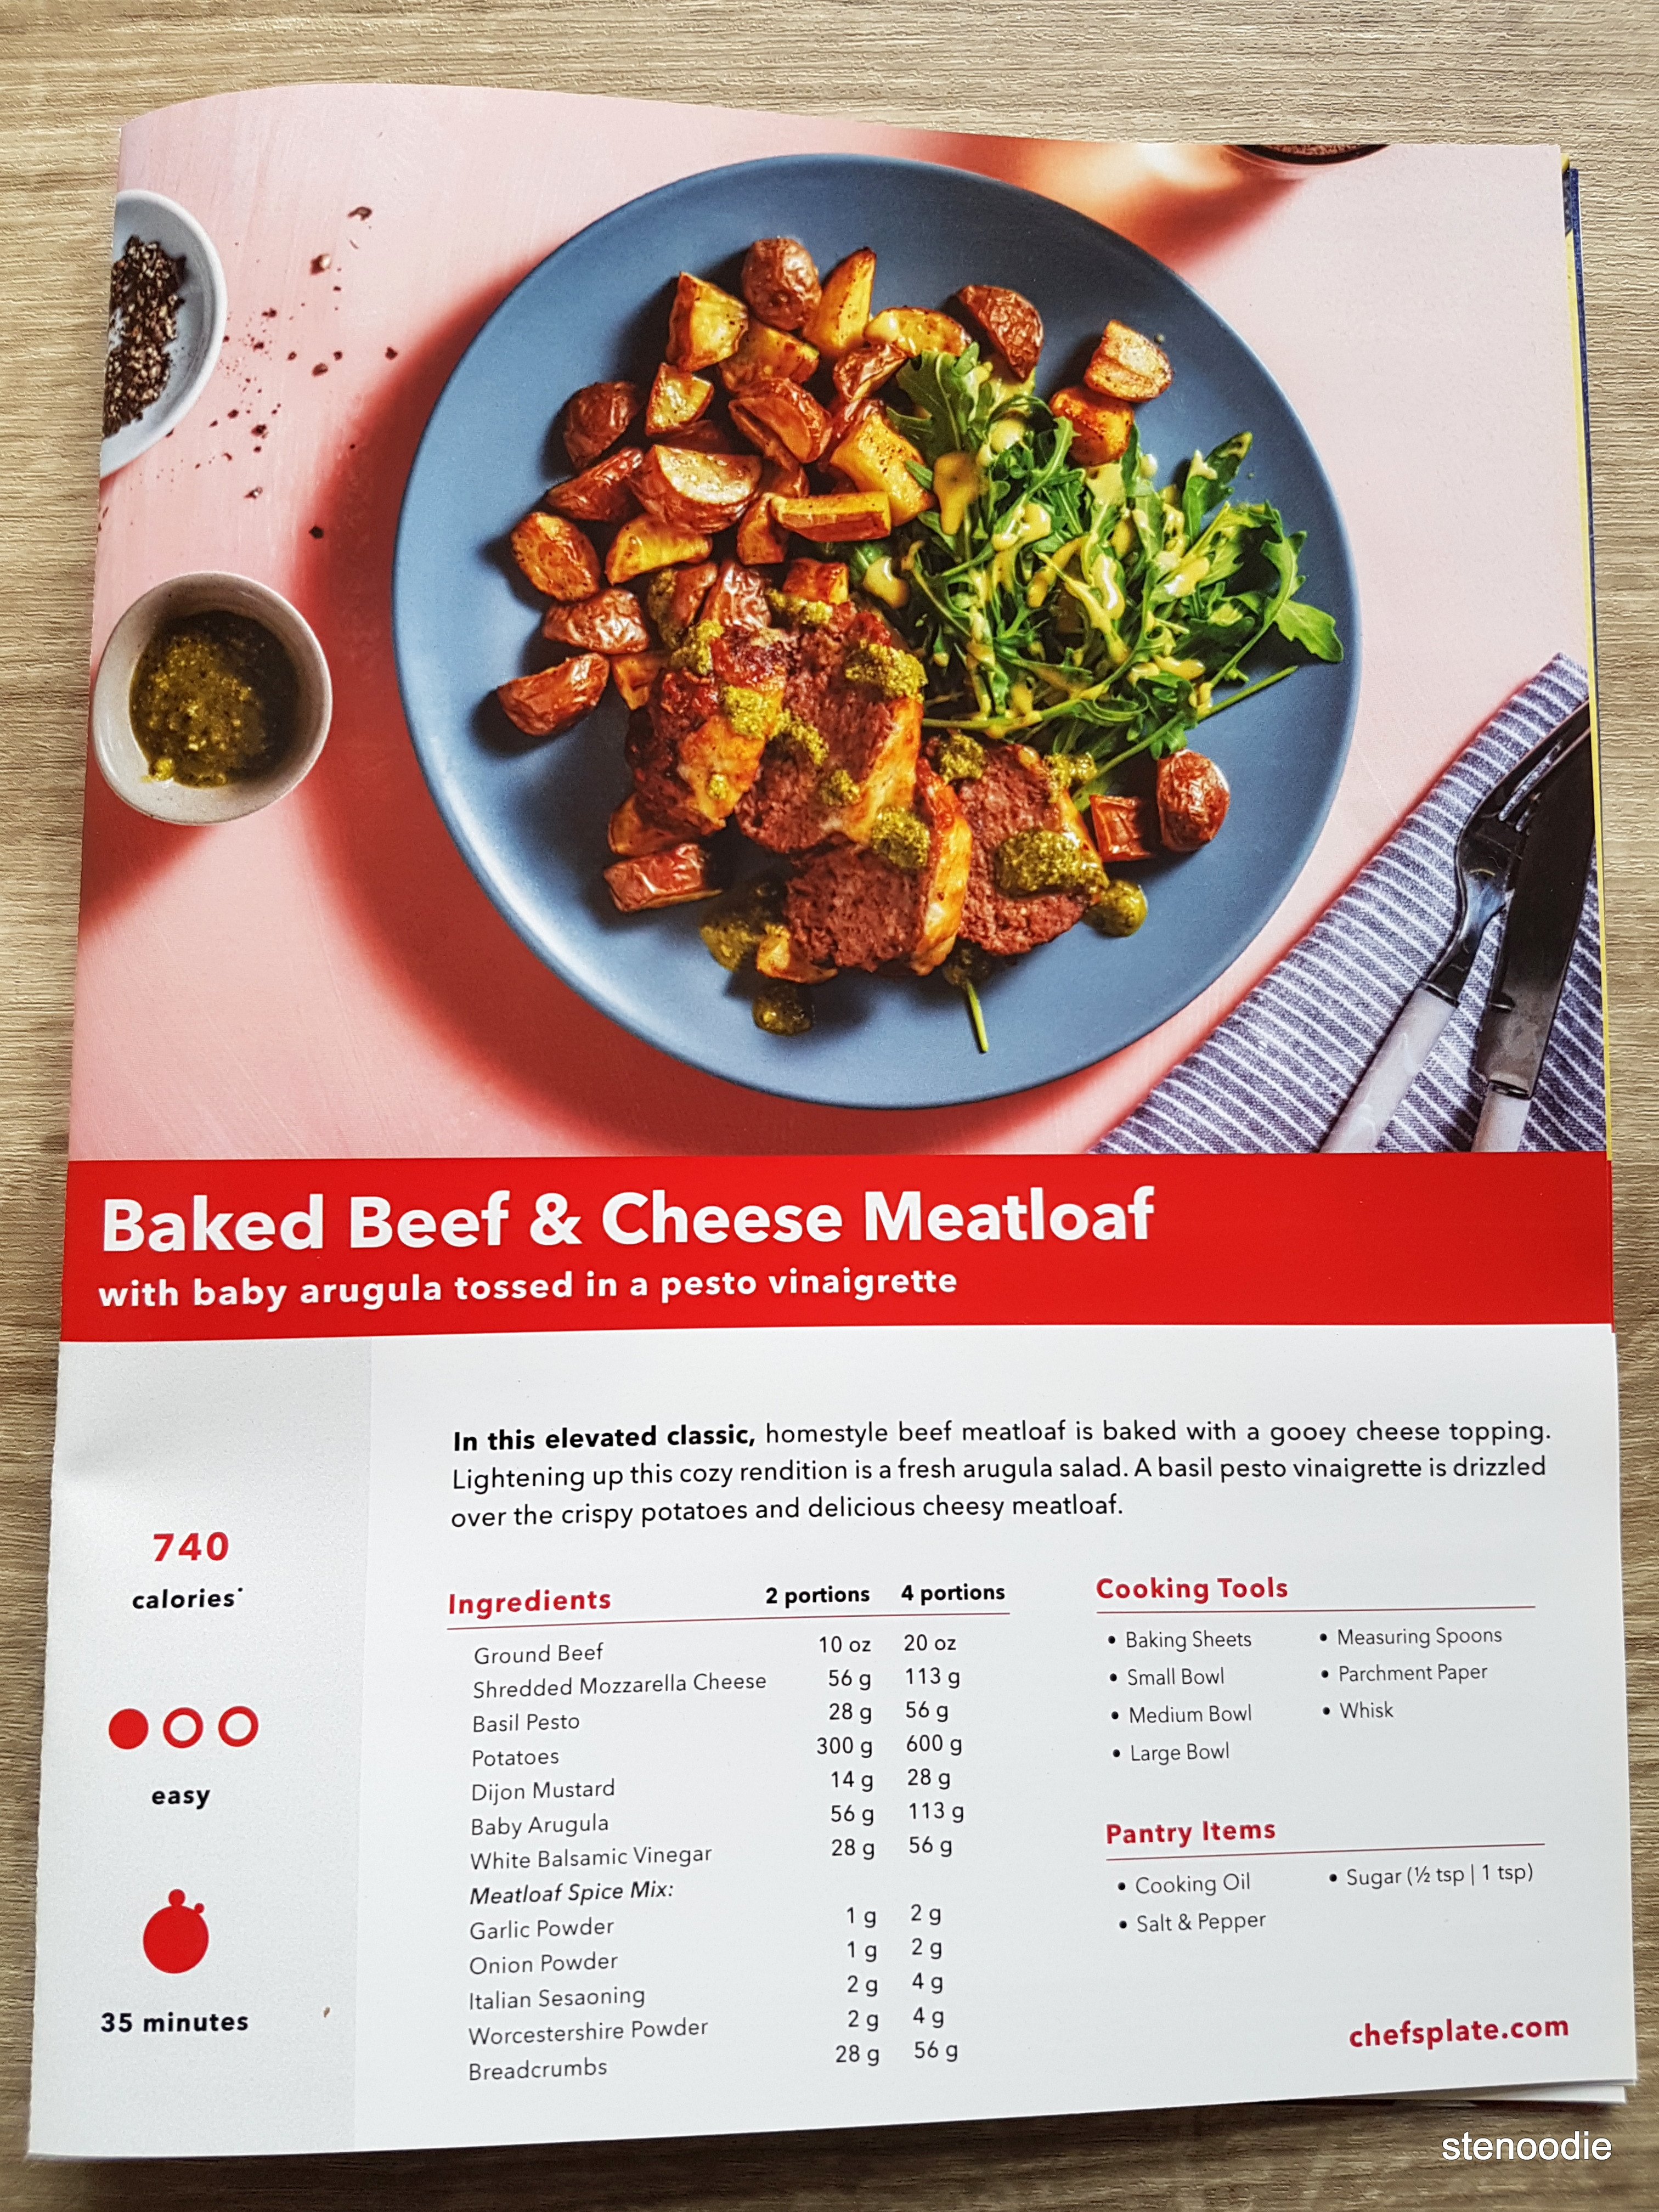 meatloaf recipe card